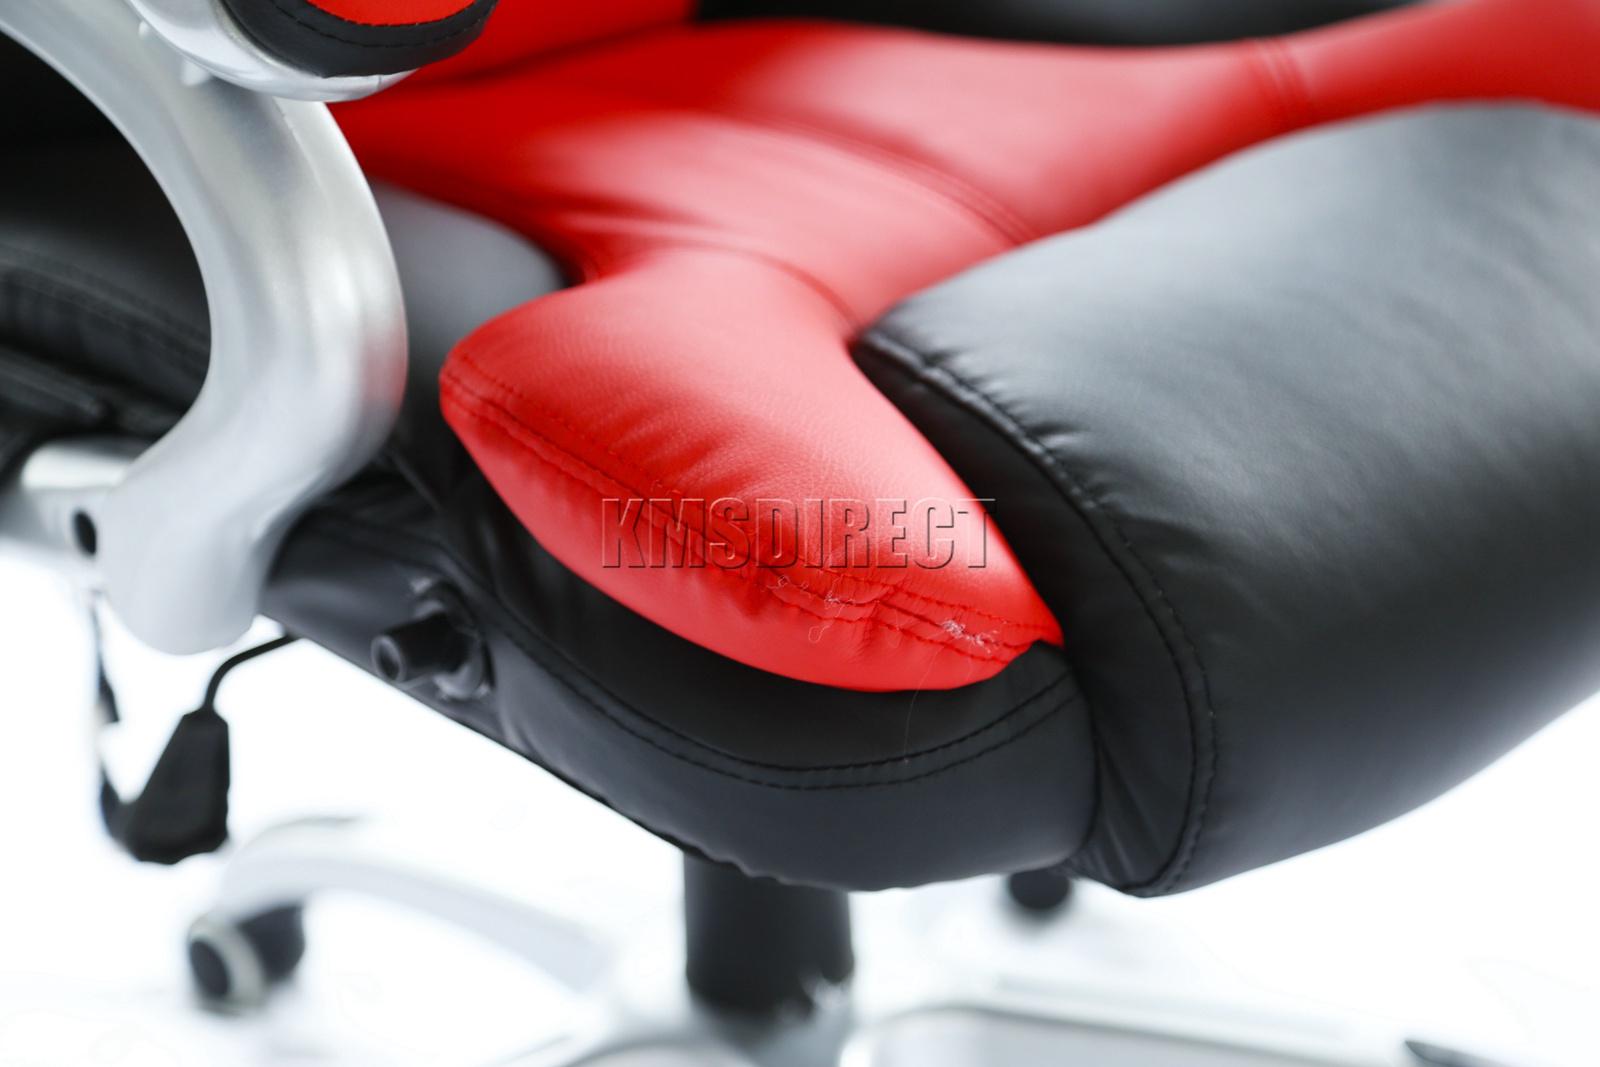 Westwood riscaldata massage sedia per ufficio u gioco computer